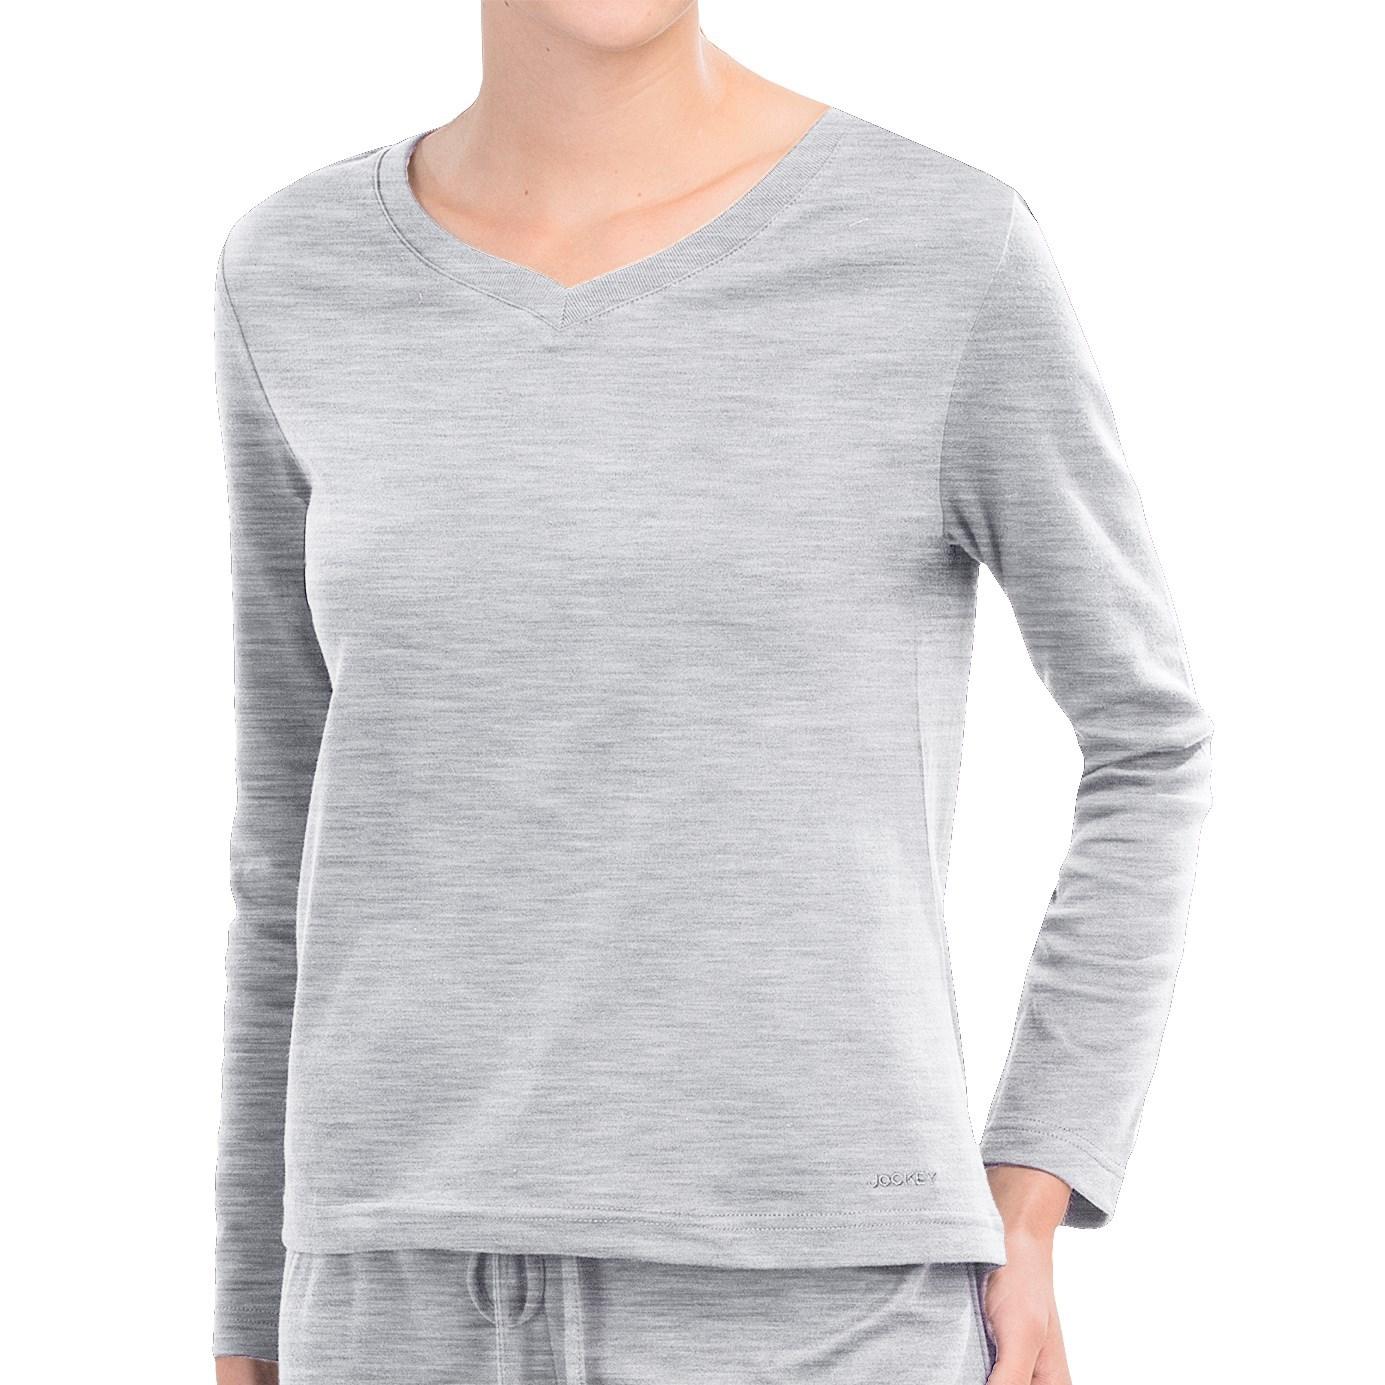 Jockey v neck lounge shirt for women save 85 for Jockey v neck shirt